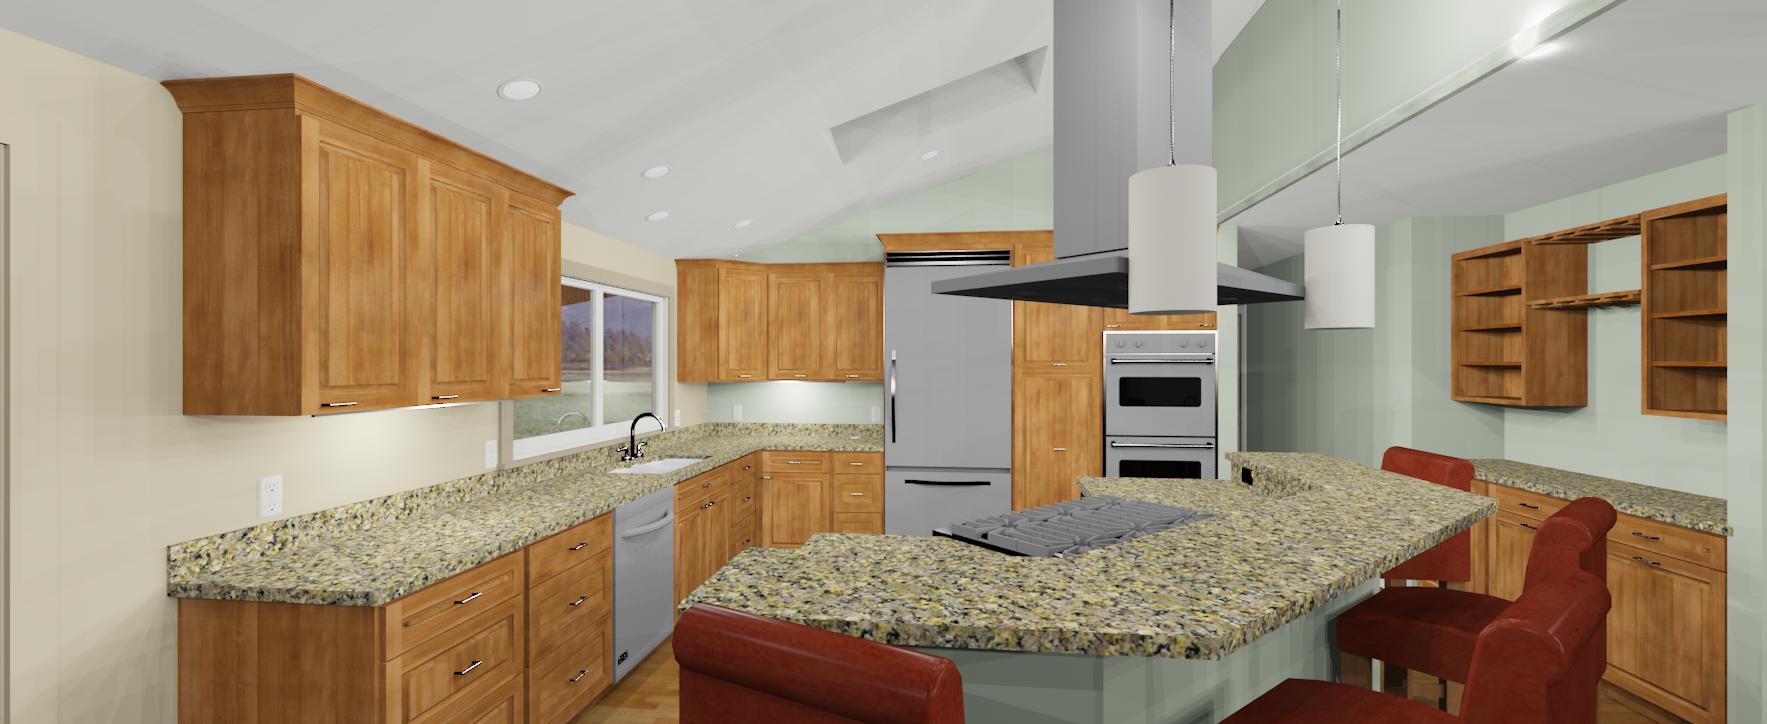 3d kitchen counter top